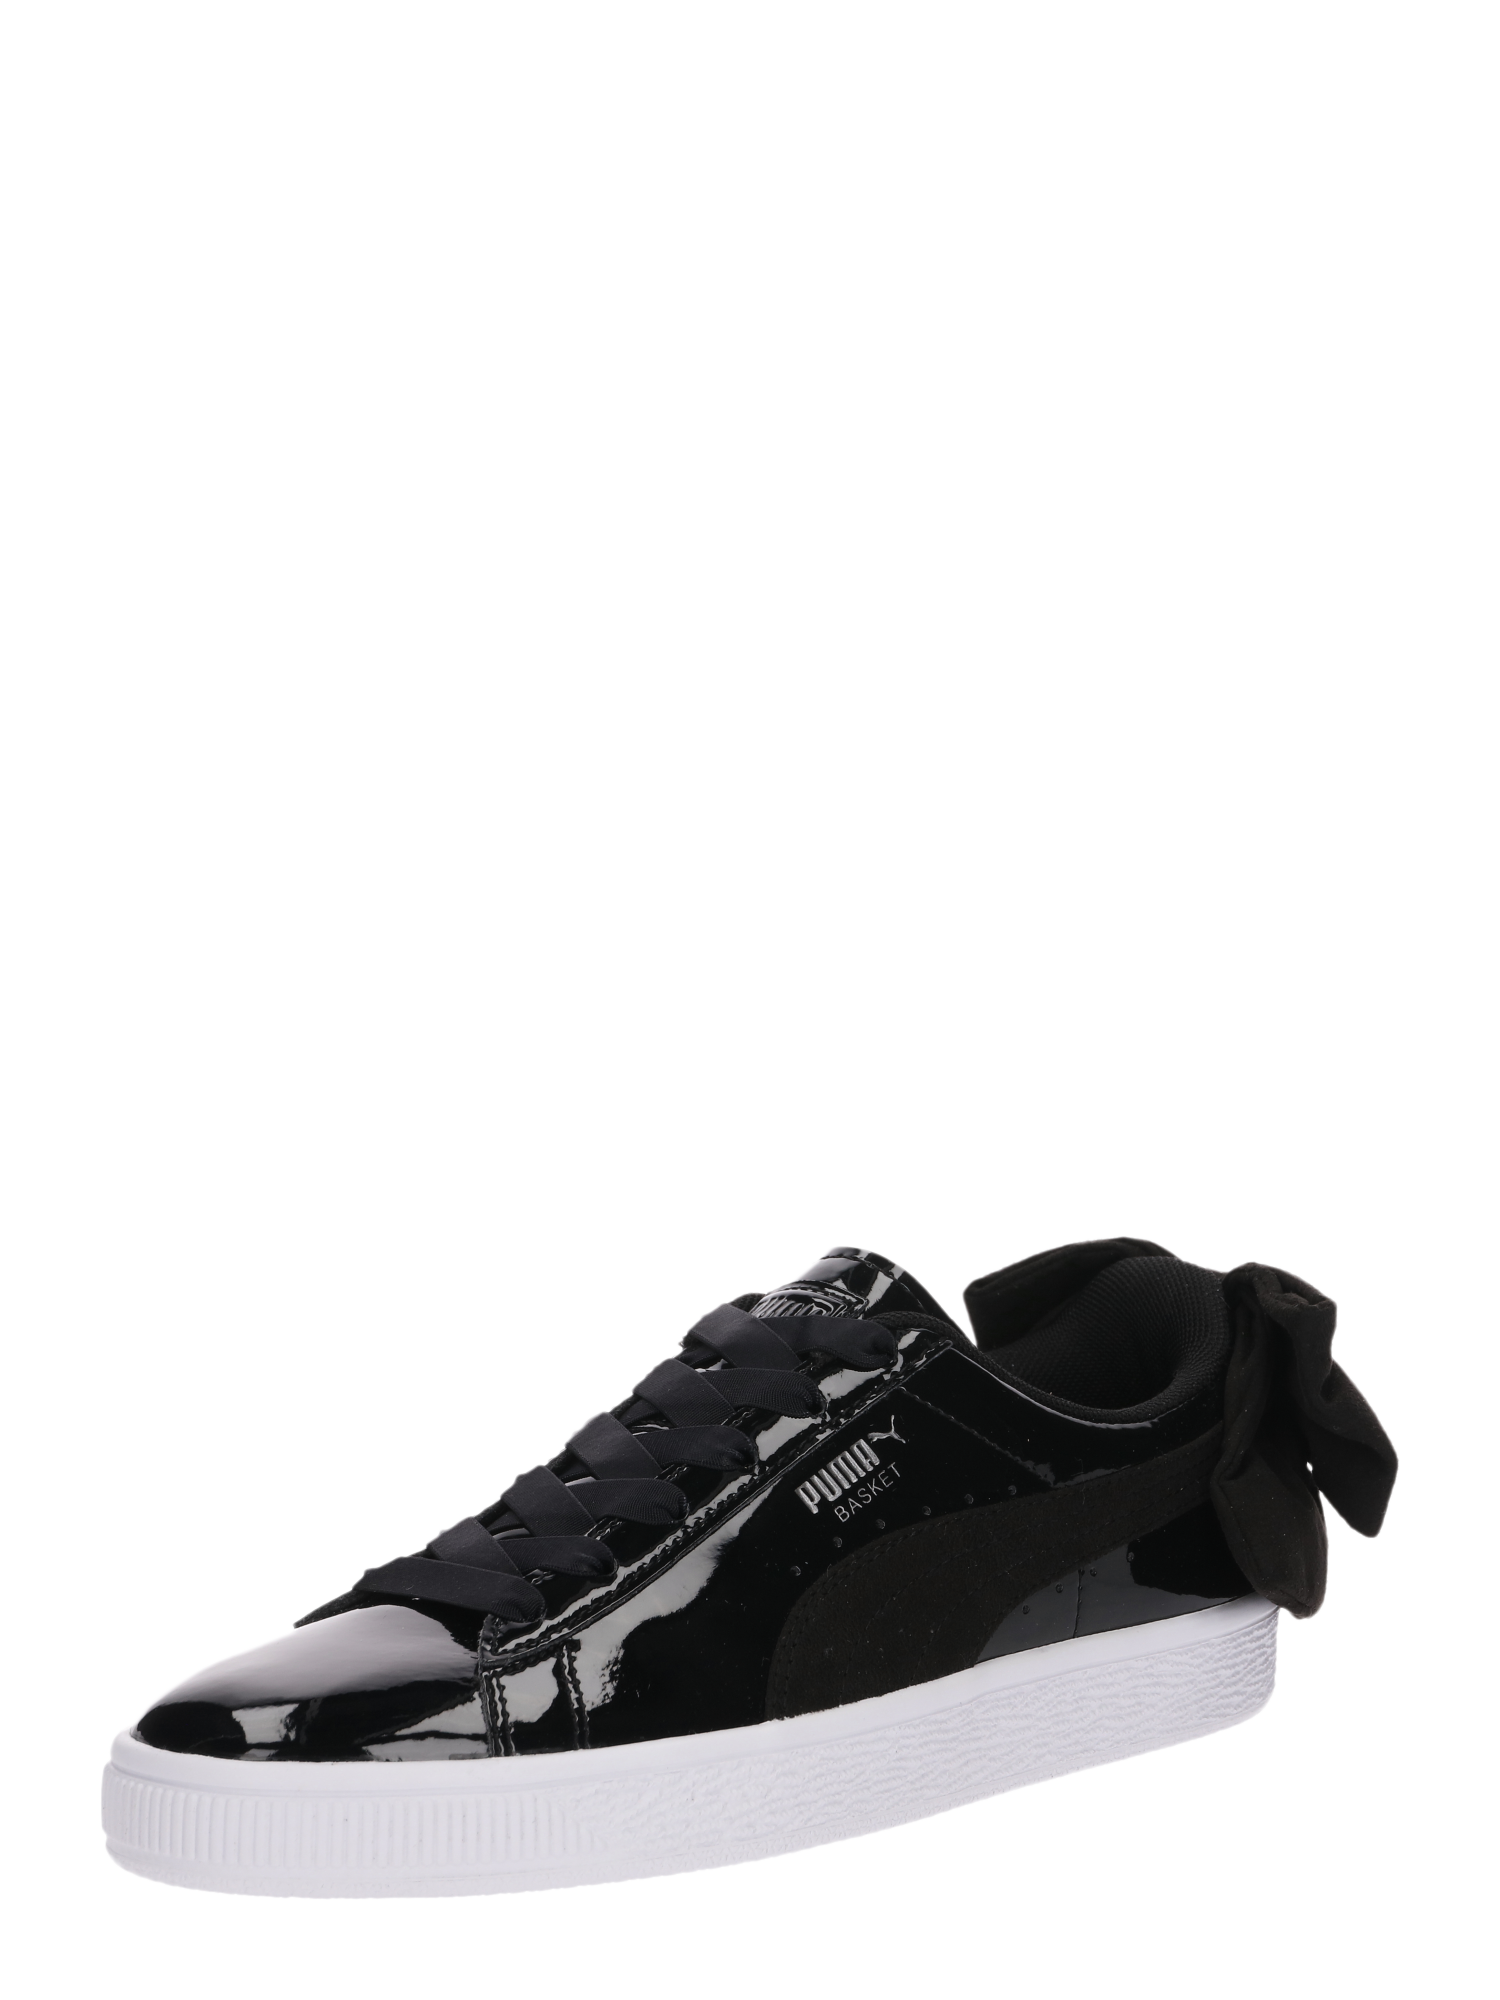 PUMA Tenisky  Basket Bow SB  černá   bílá - Glami.cz 273479a6b29